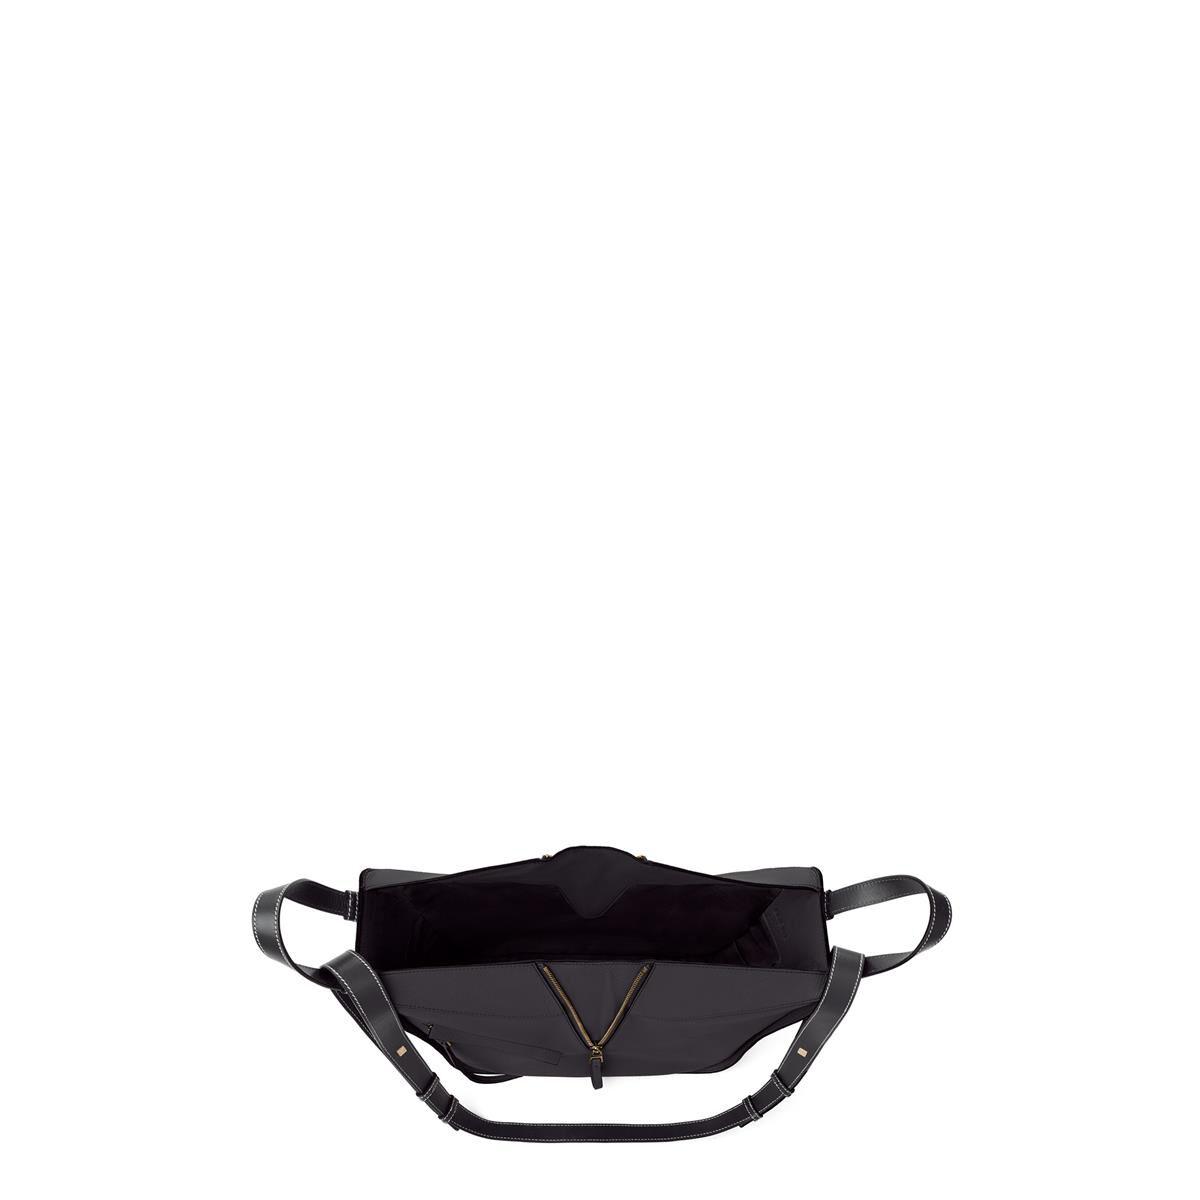 LOEWE ハンモック スモール バッグ ミッドナイトブルー/ブラック all